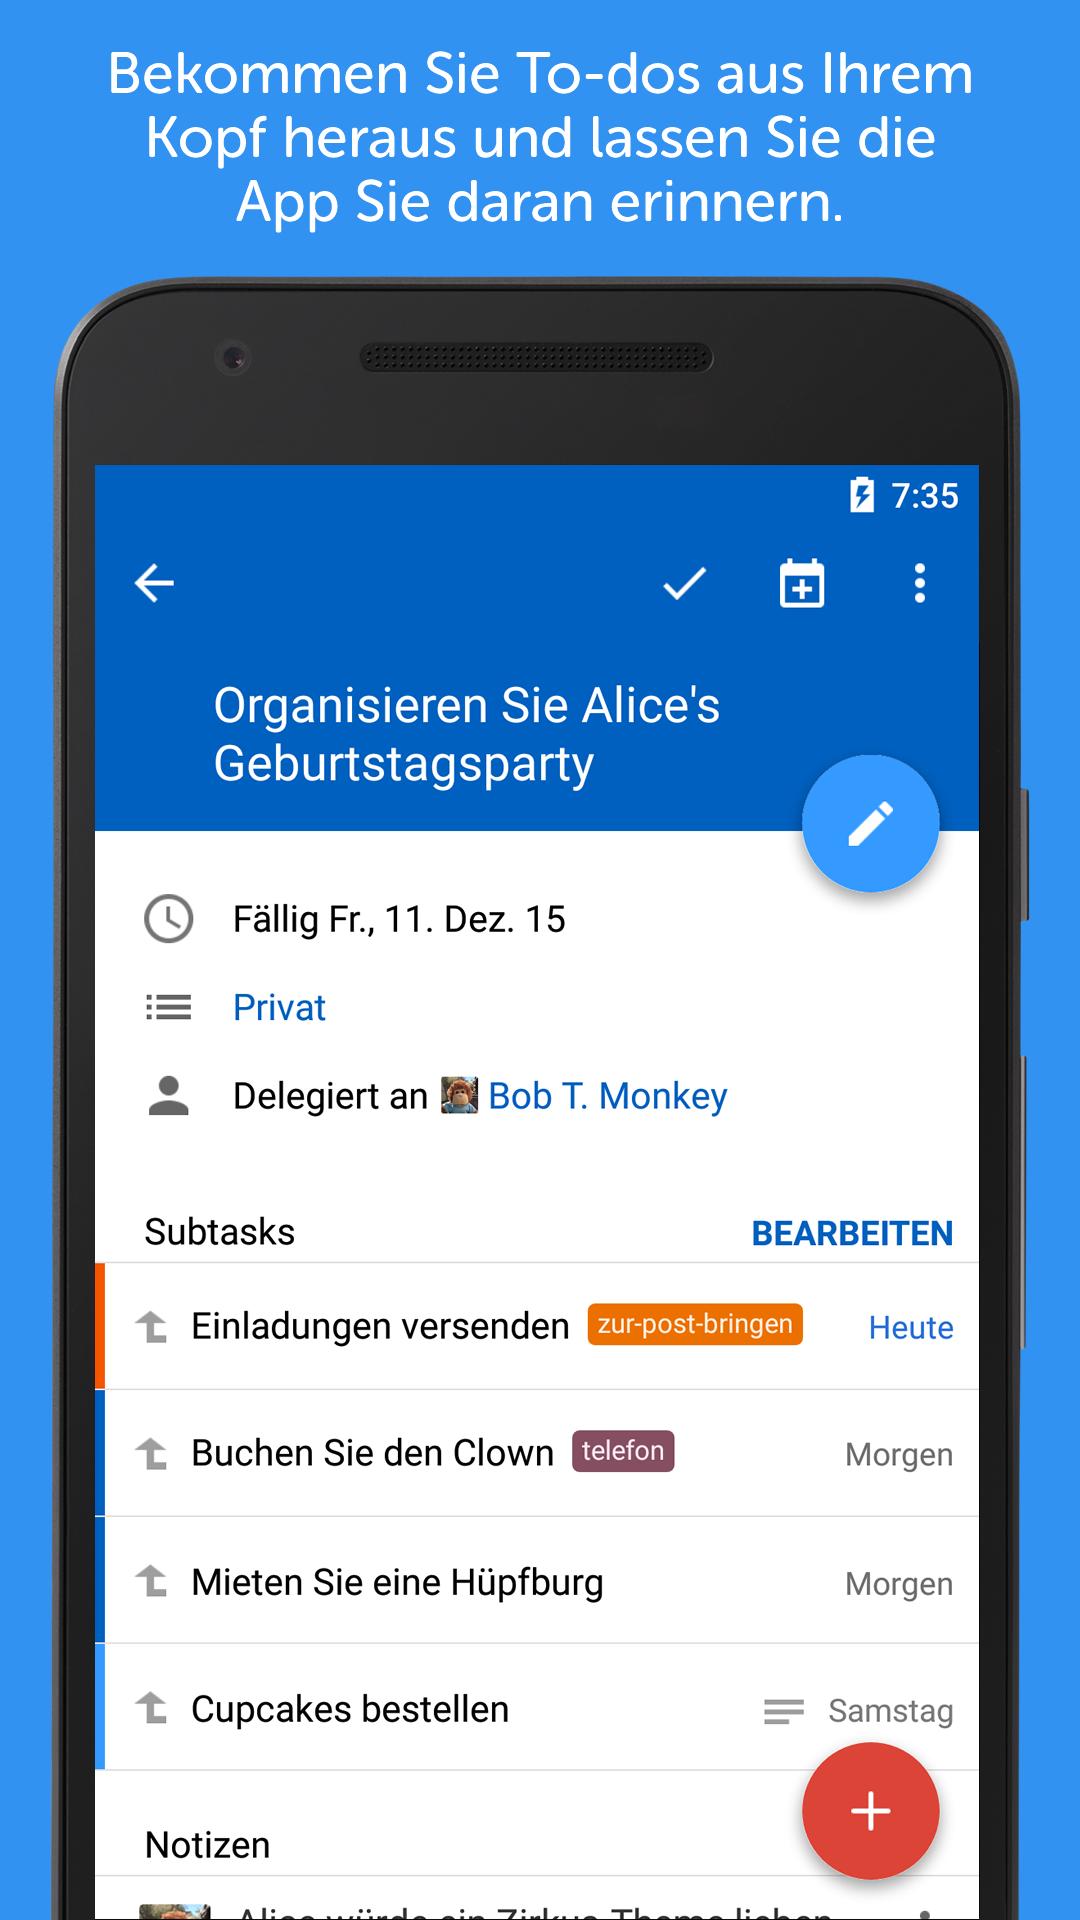 Remember The Milk: Amazon.de: Apps für Android